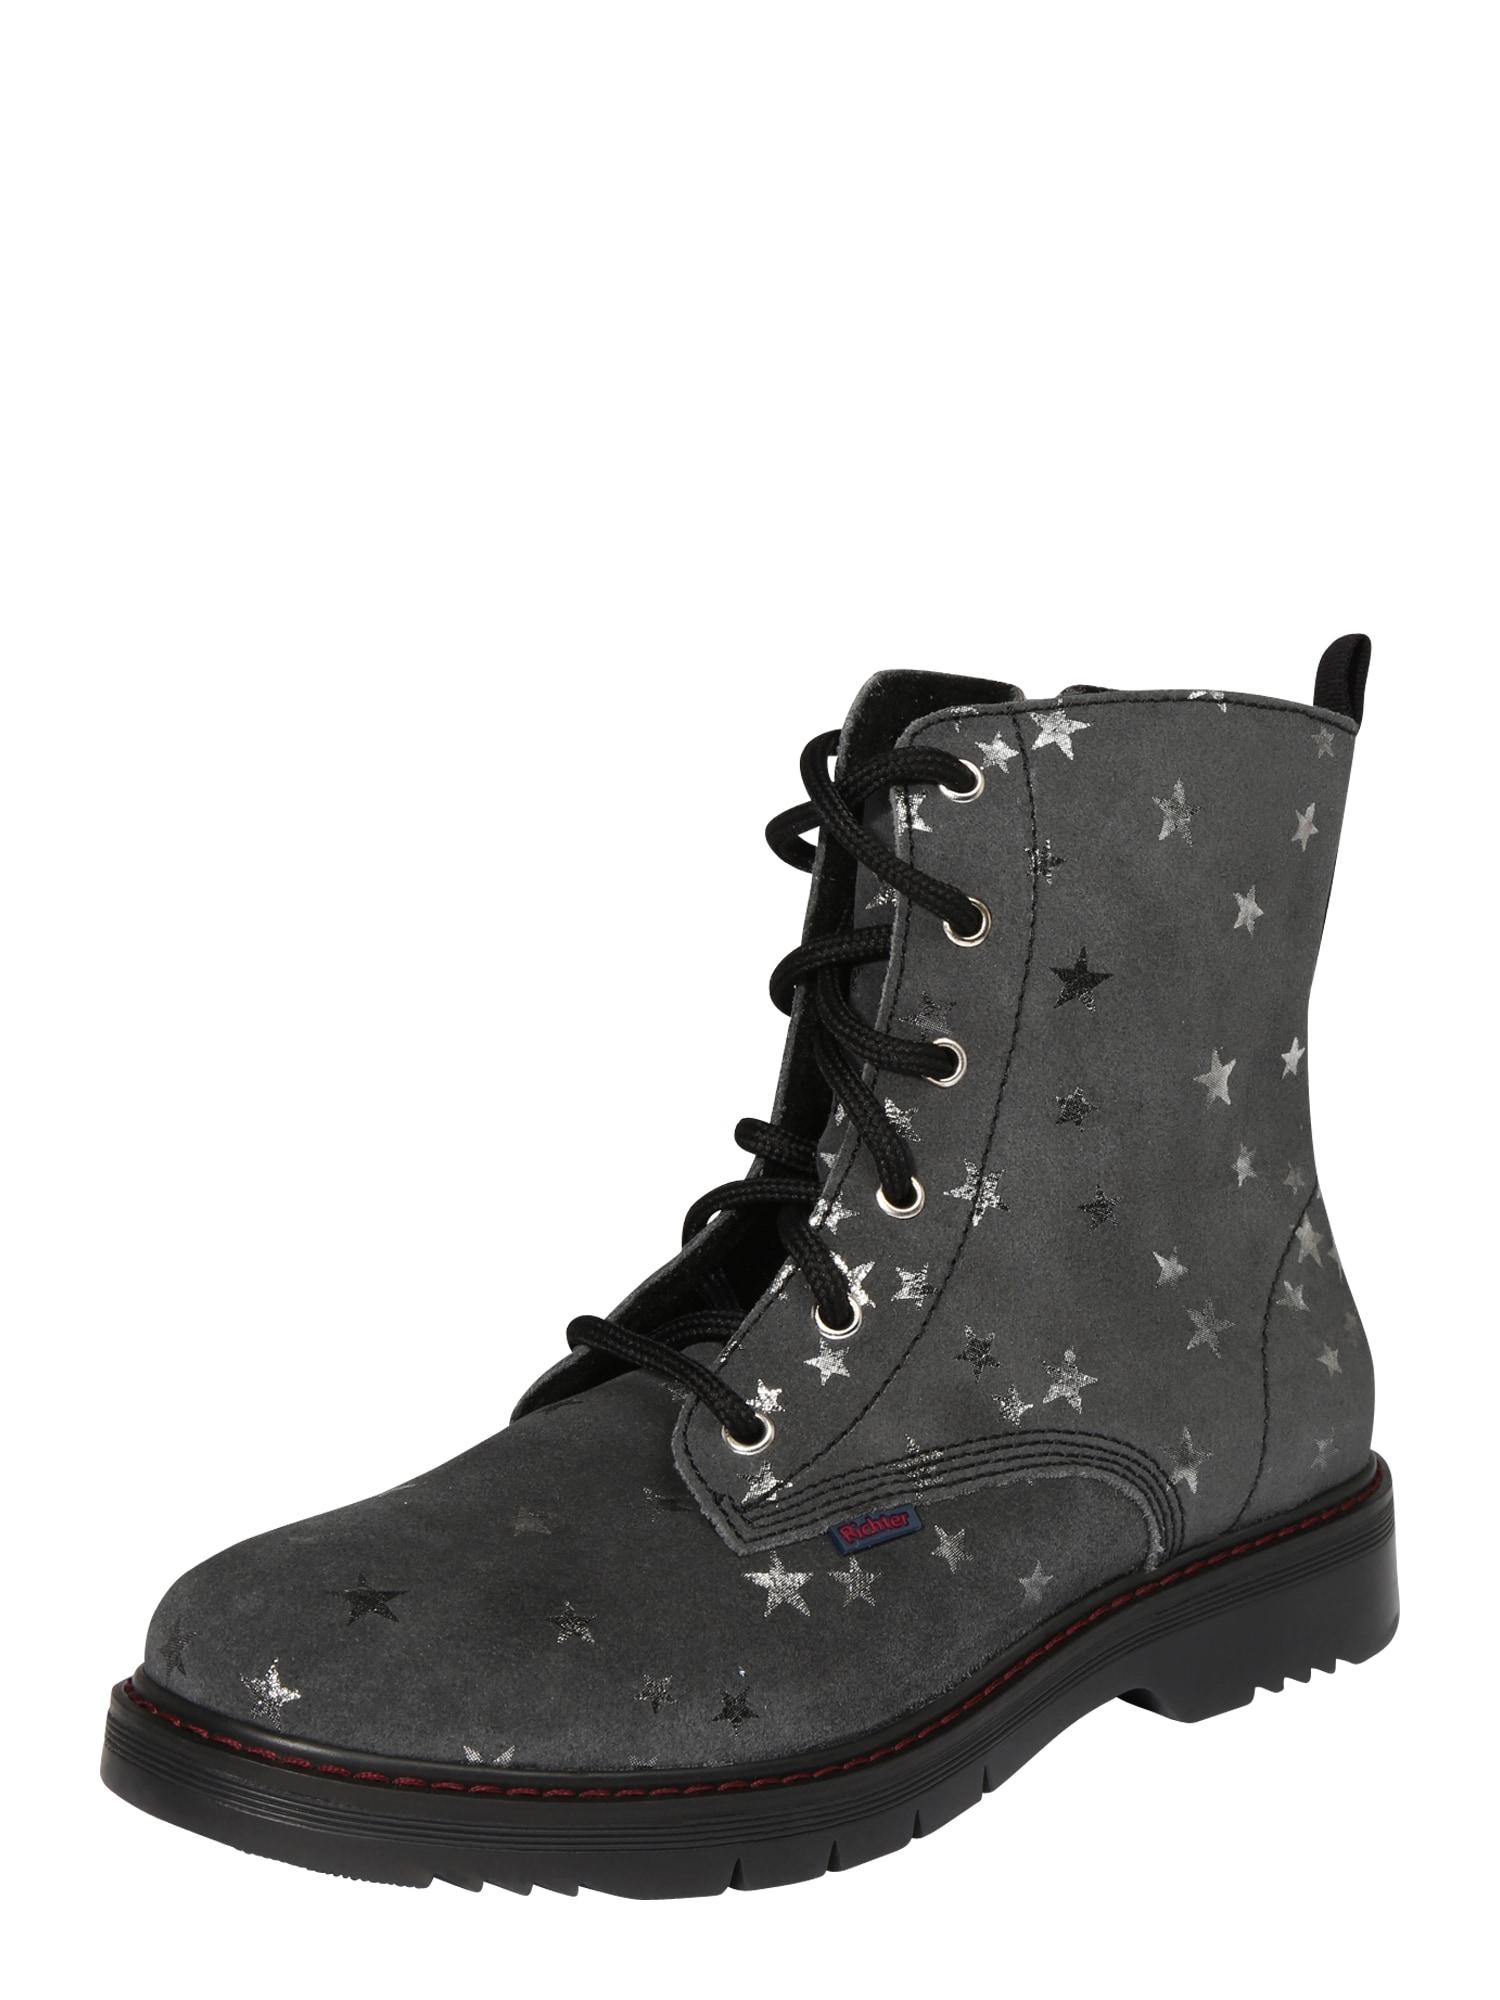 RICHTER Auliniai batai su kulniuku pilka